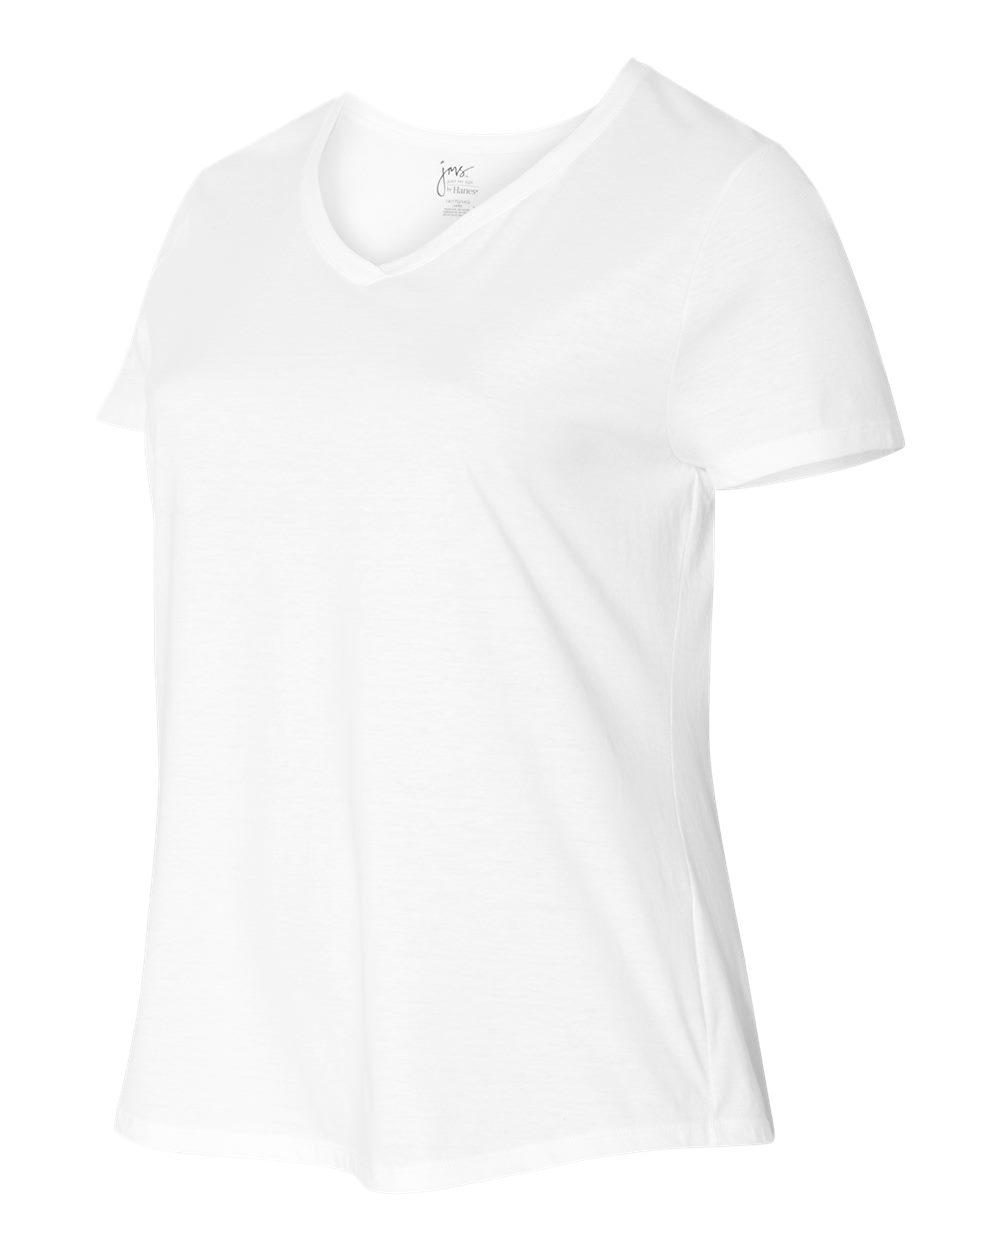 74af02e7322 Hanes JMS30 - Just My Size Women s Short Sleeve V-Neck Tee  6.68 ...